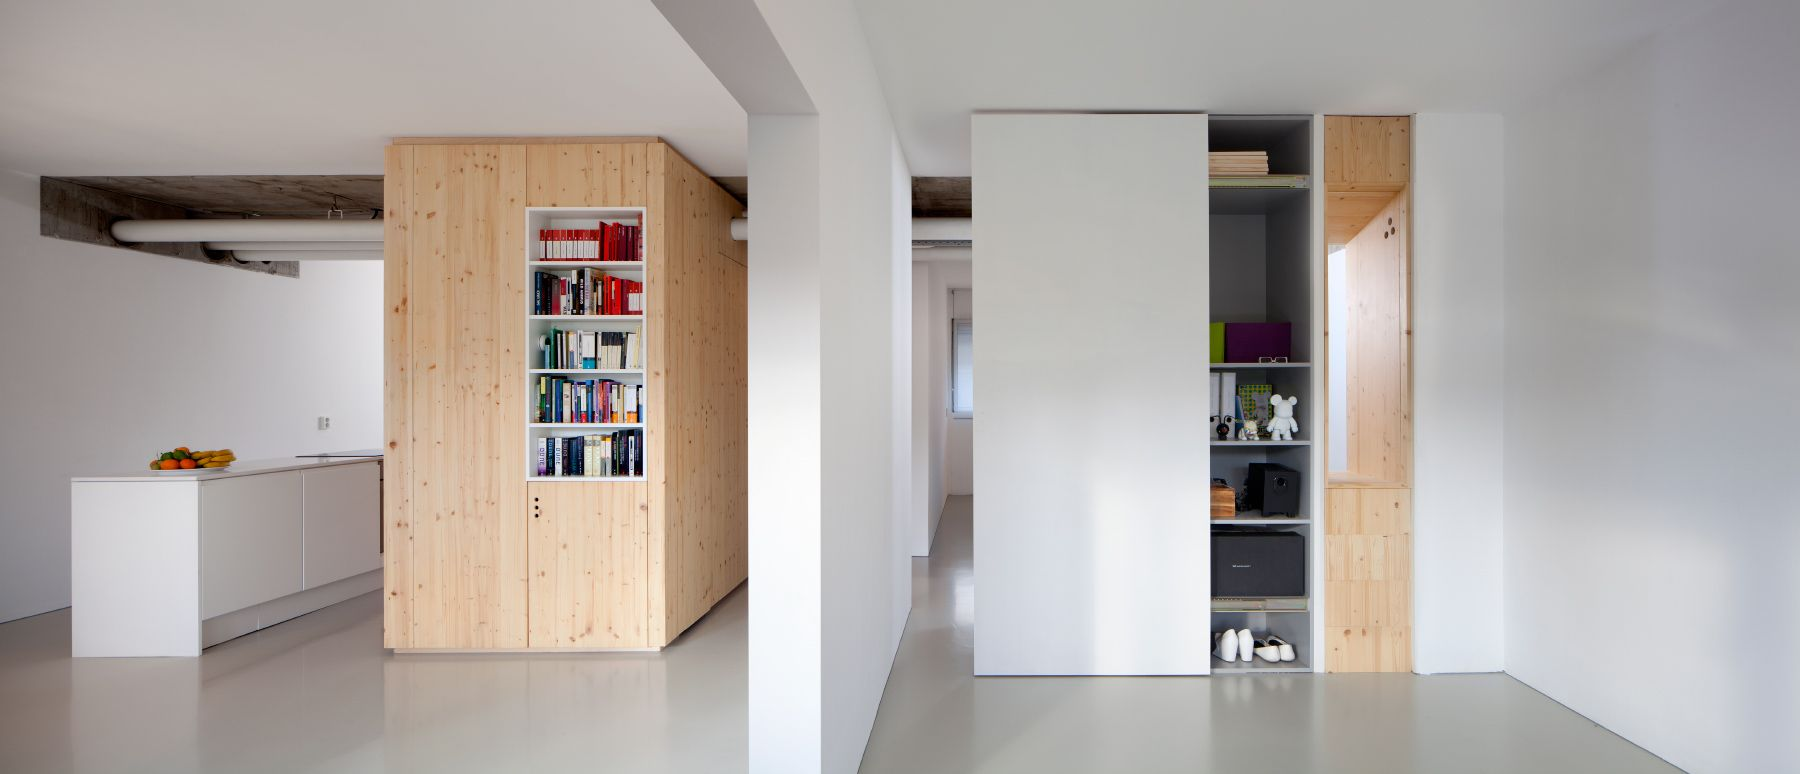 House singel amsterdam nl laura alvarez architecture amsterdam